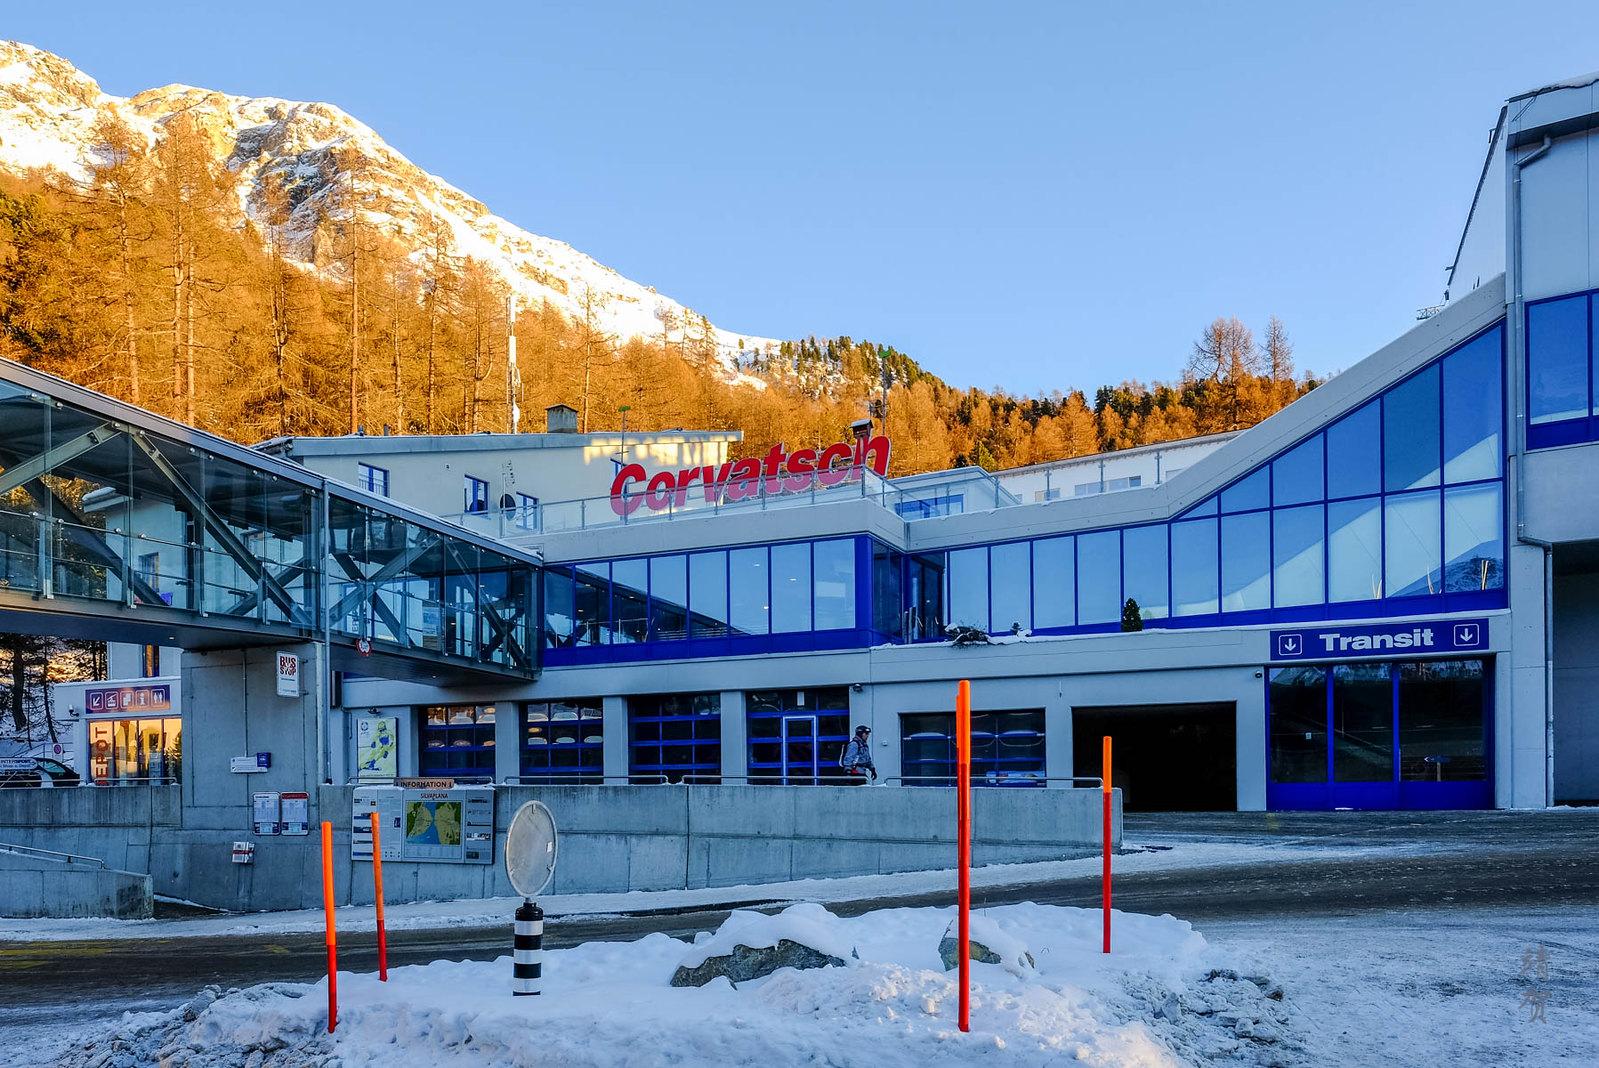 Corvatsch Station at Surlej